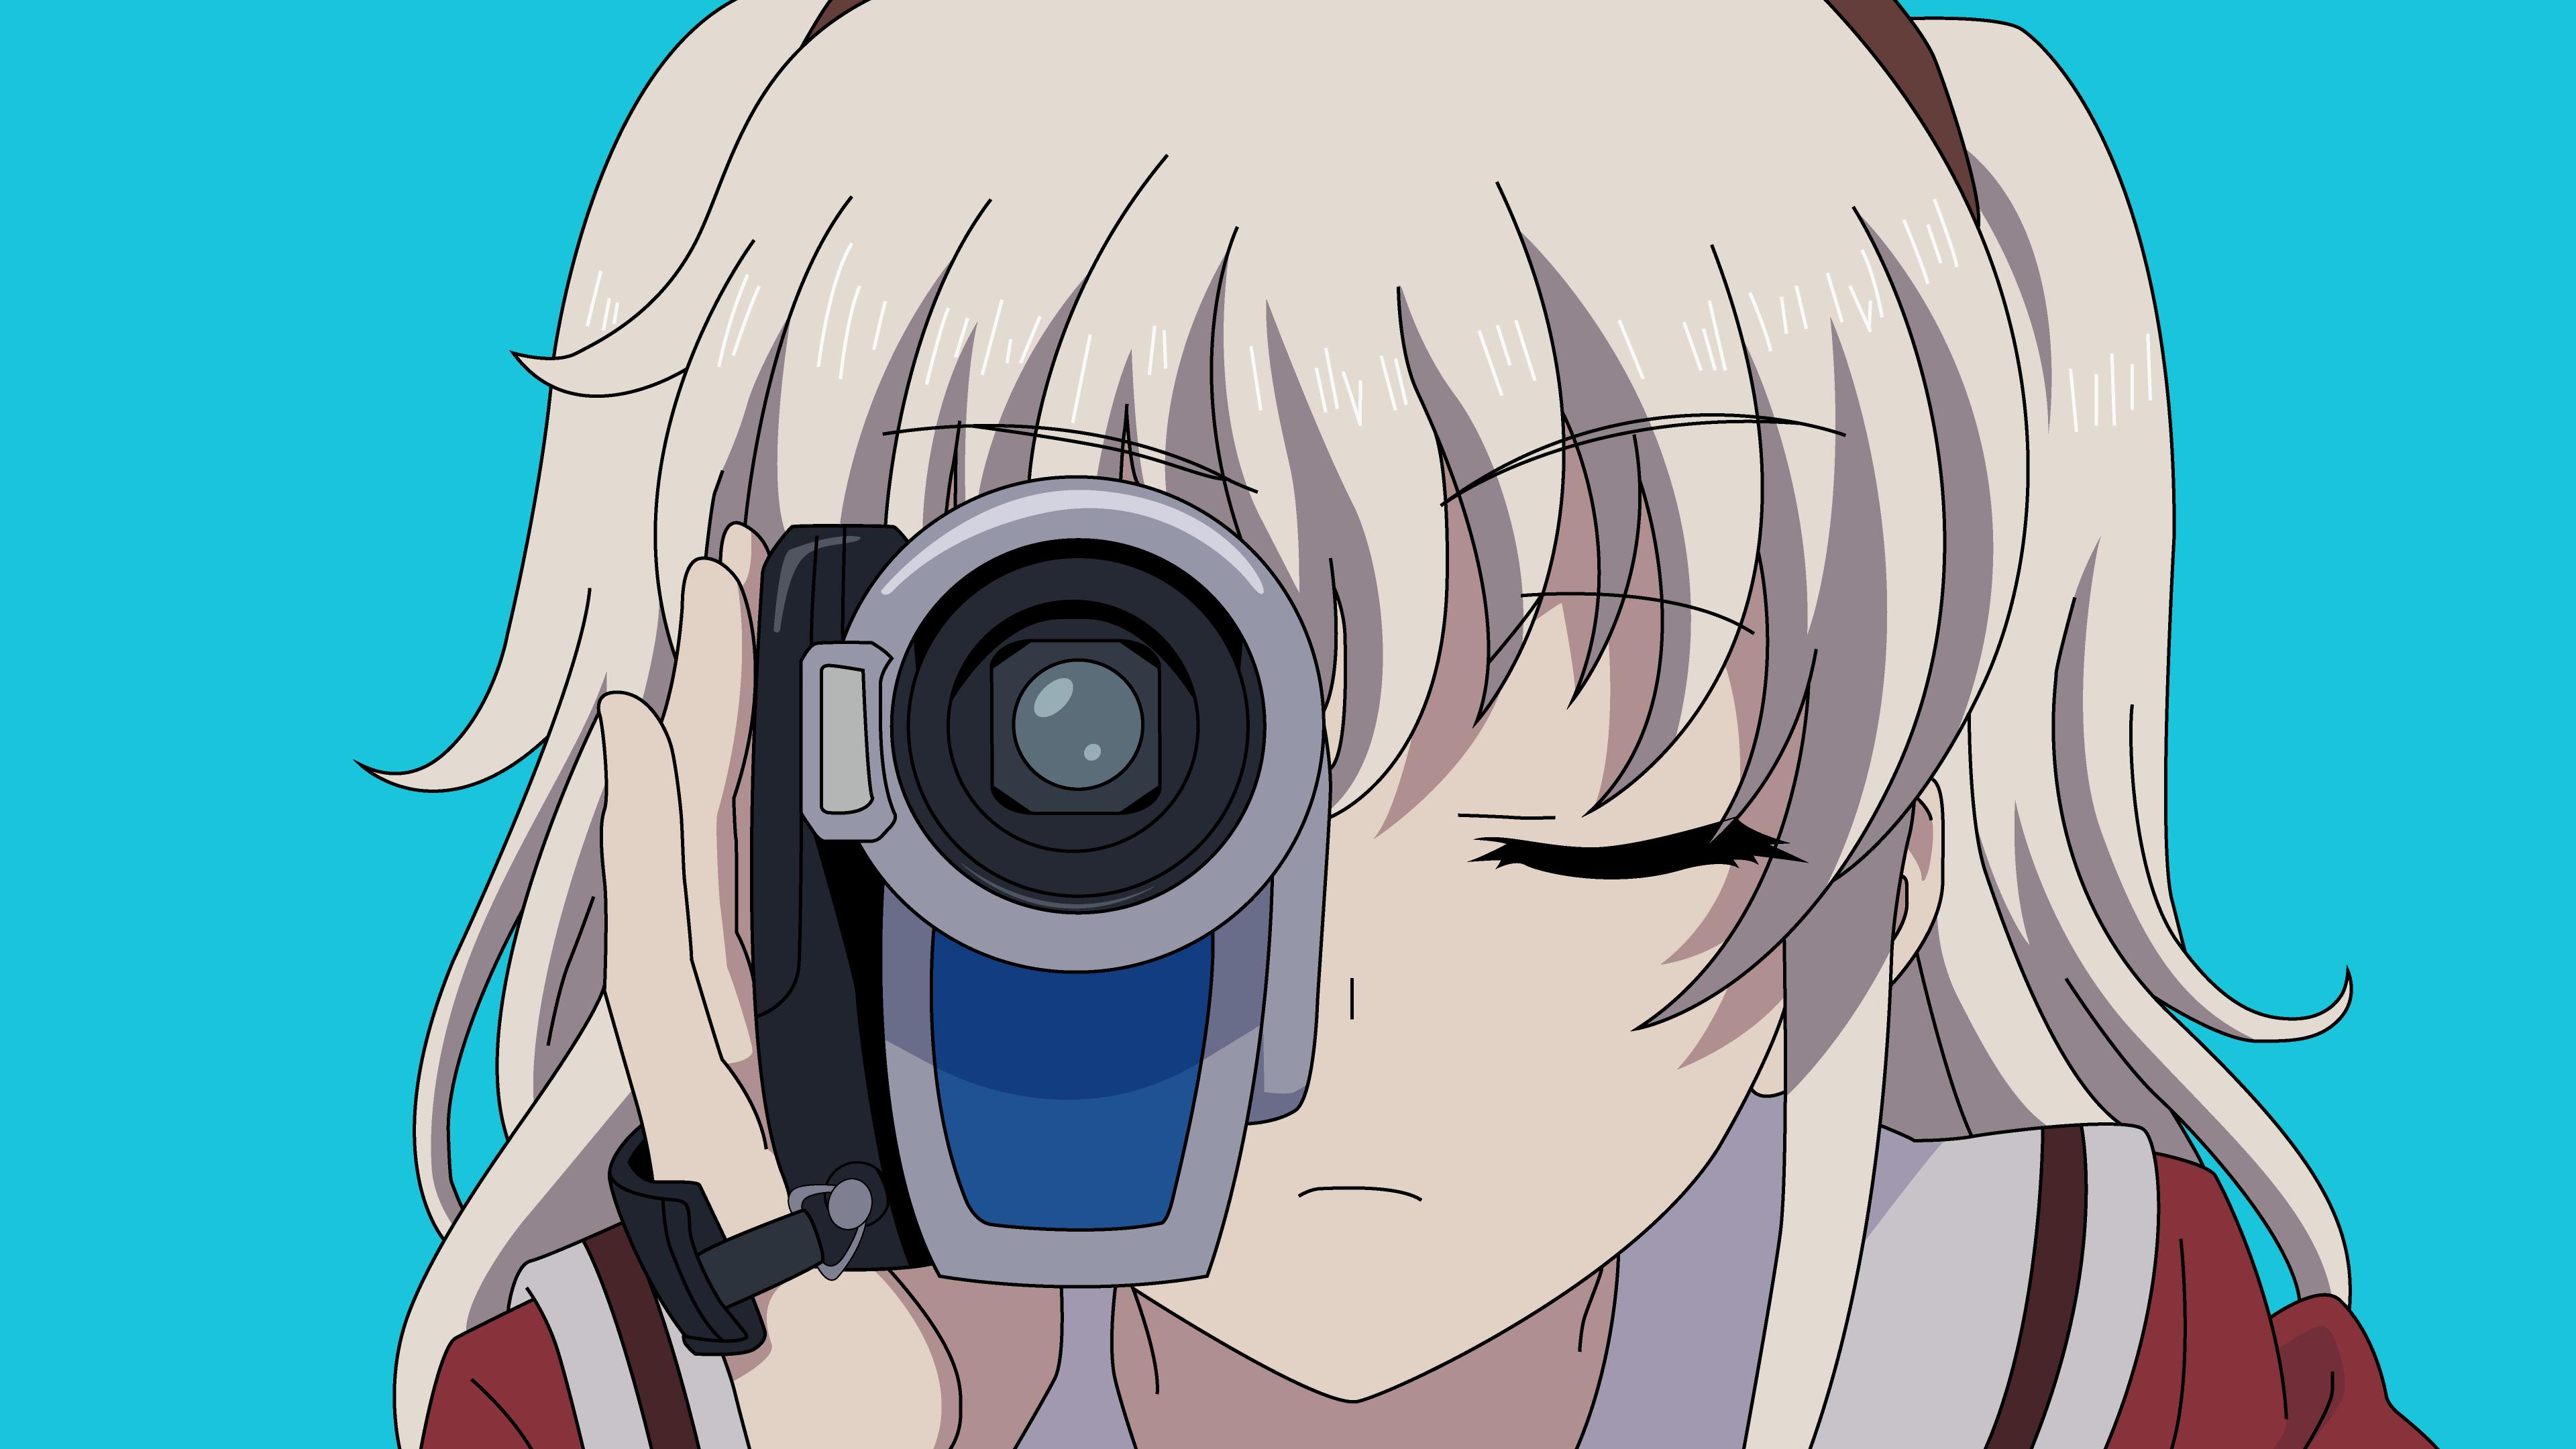 Nao Tomori 4k Ultra Fond d'écran HD   Arrière-Plan   3840x2160 ...